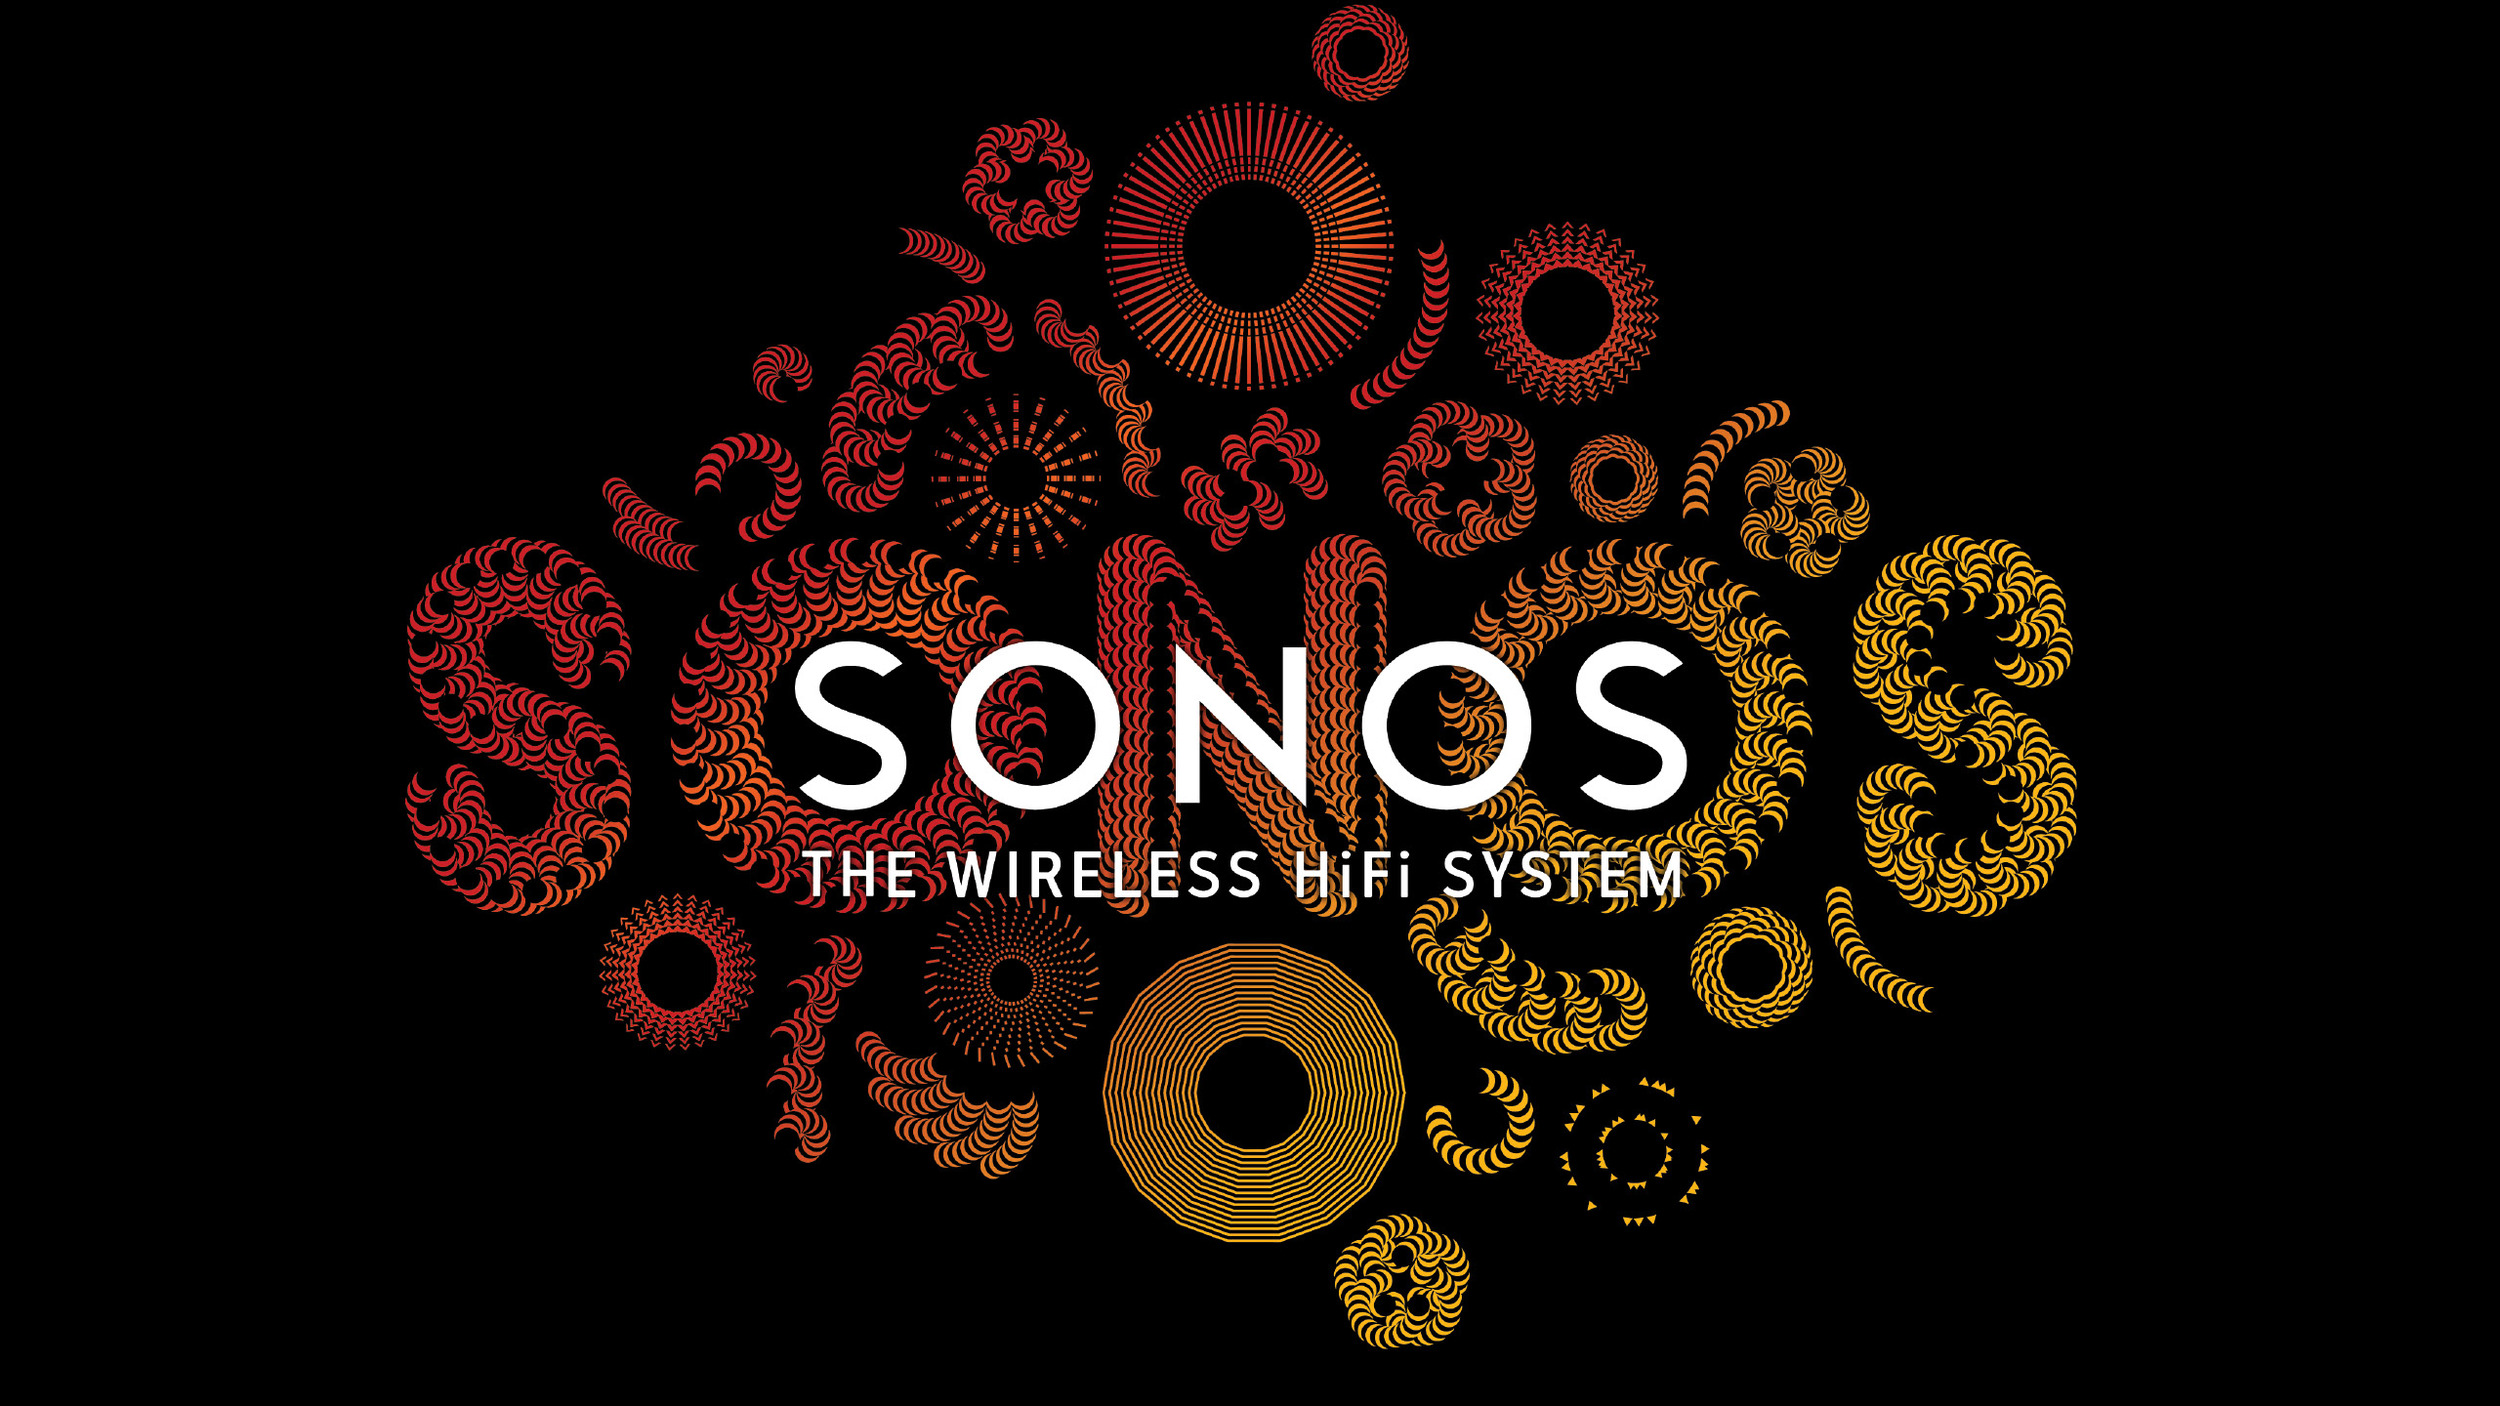 Sonos_Screen_2560x1440_v01B.jpg